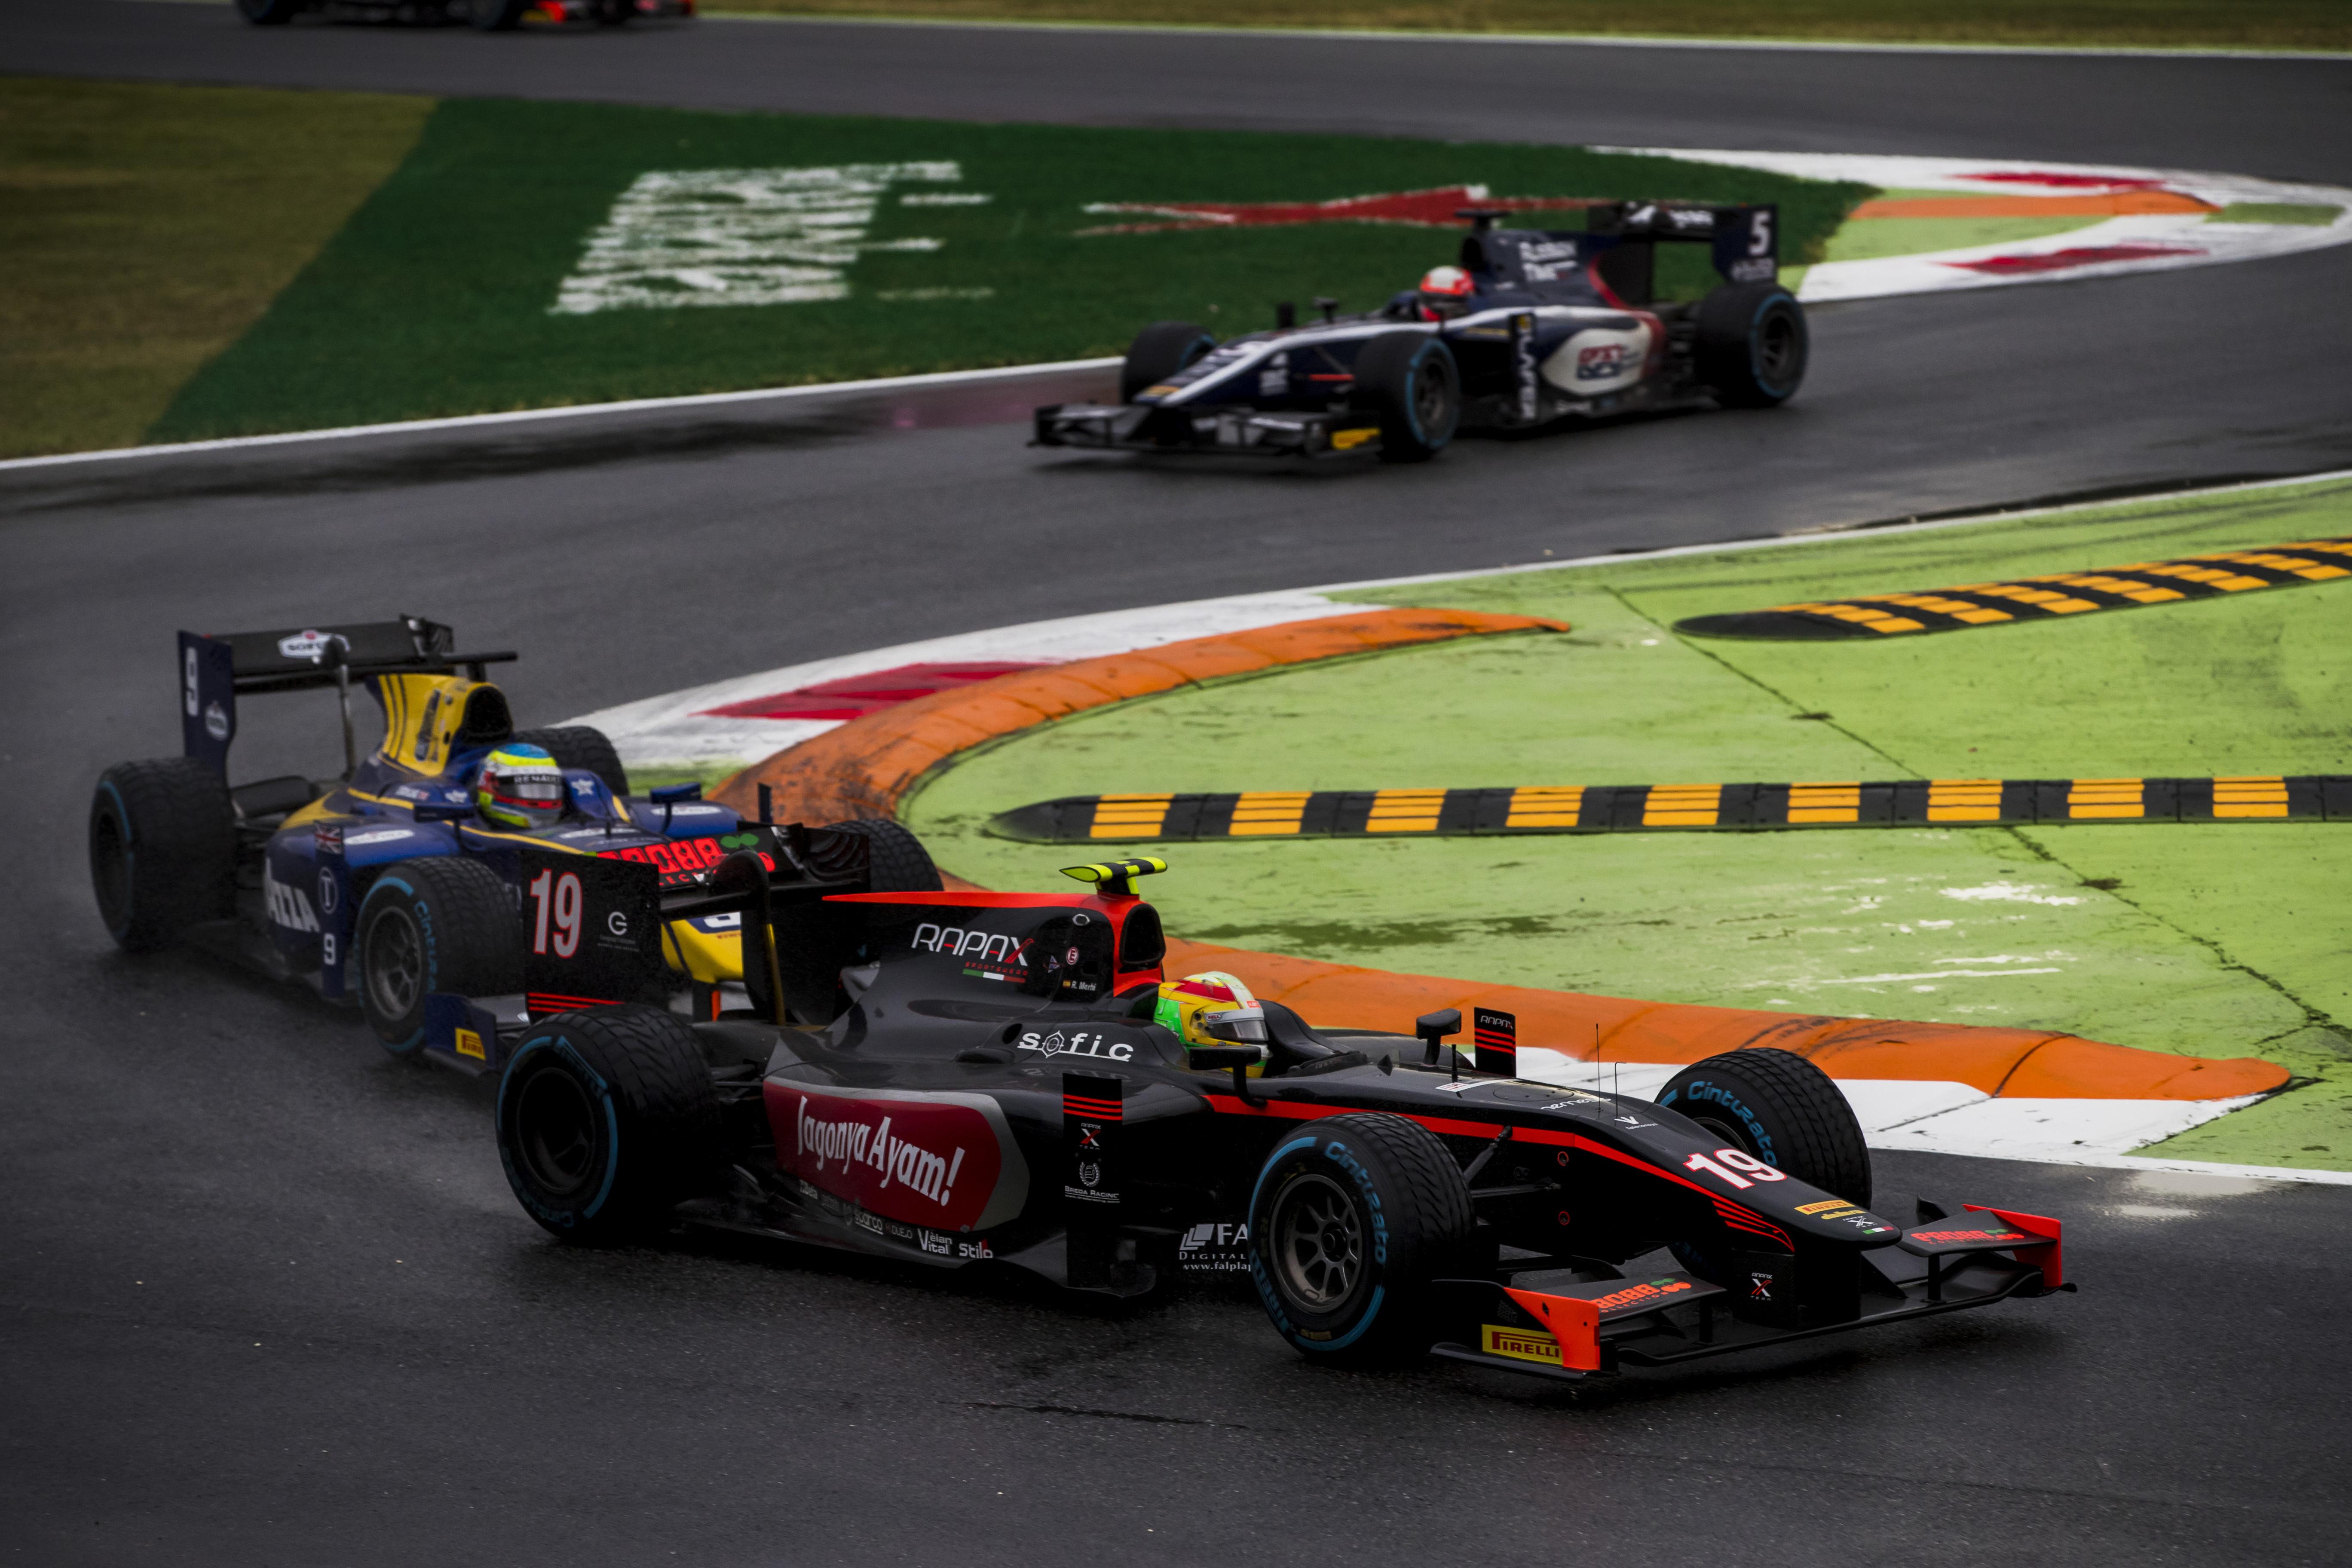 Roberto Merhi F2 Monza 2017